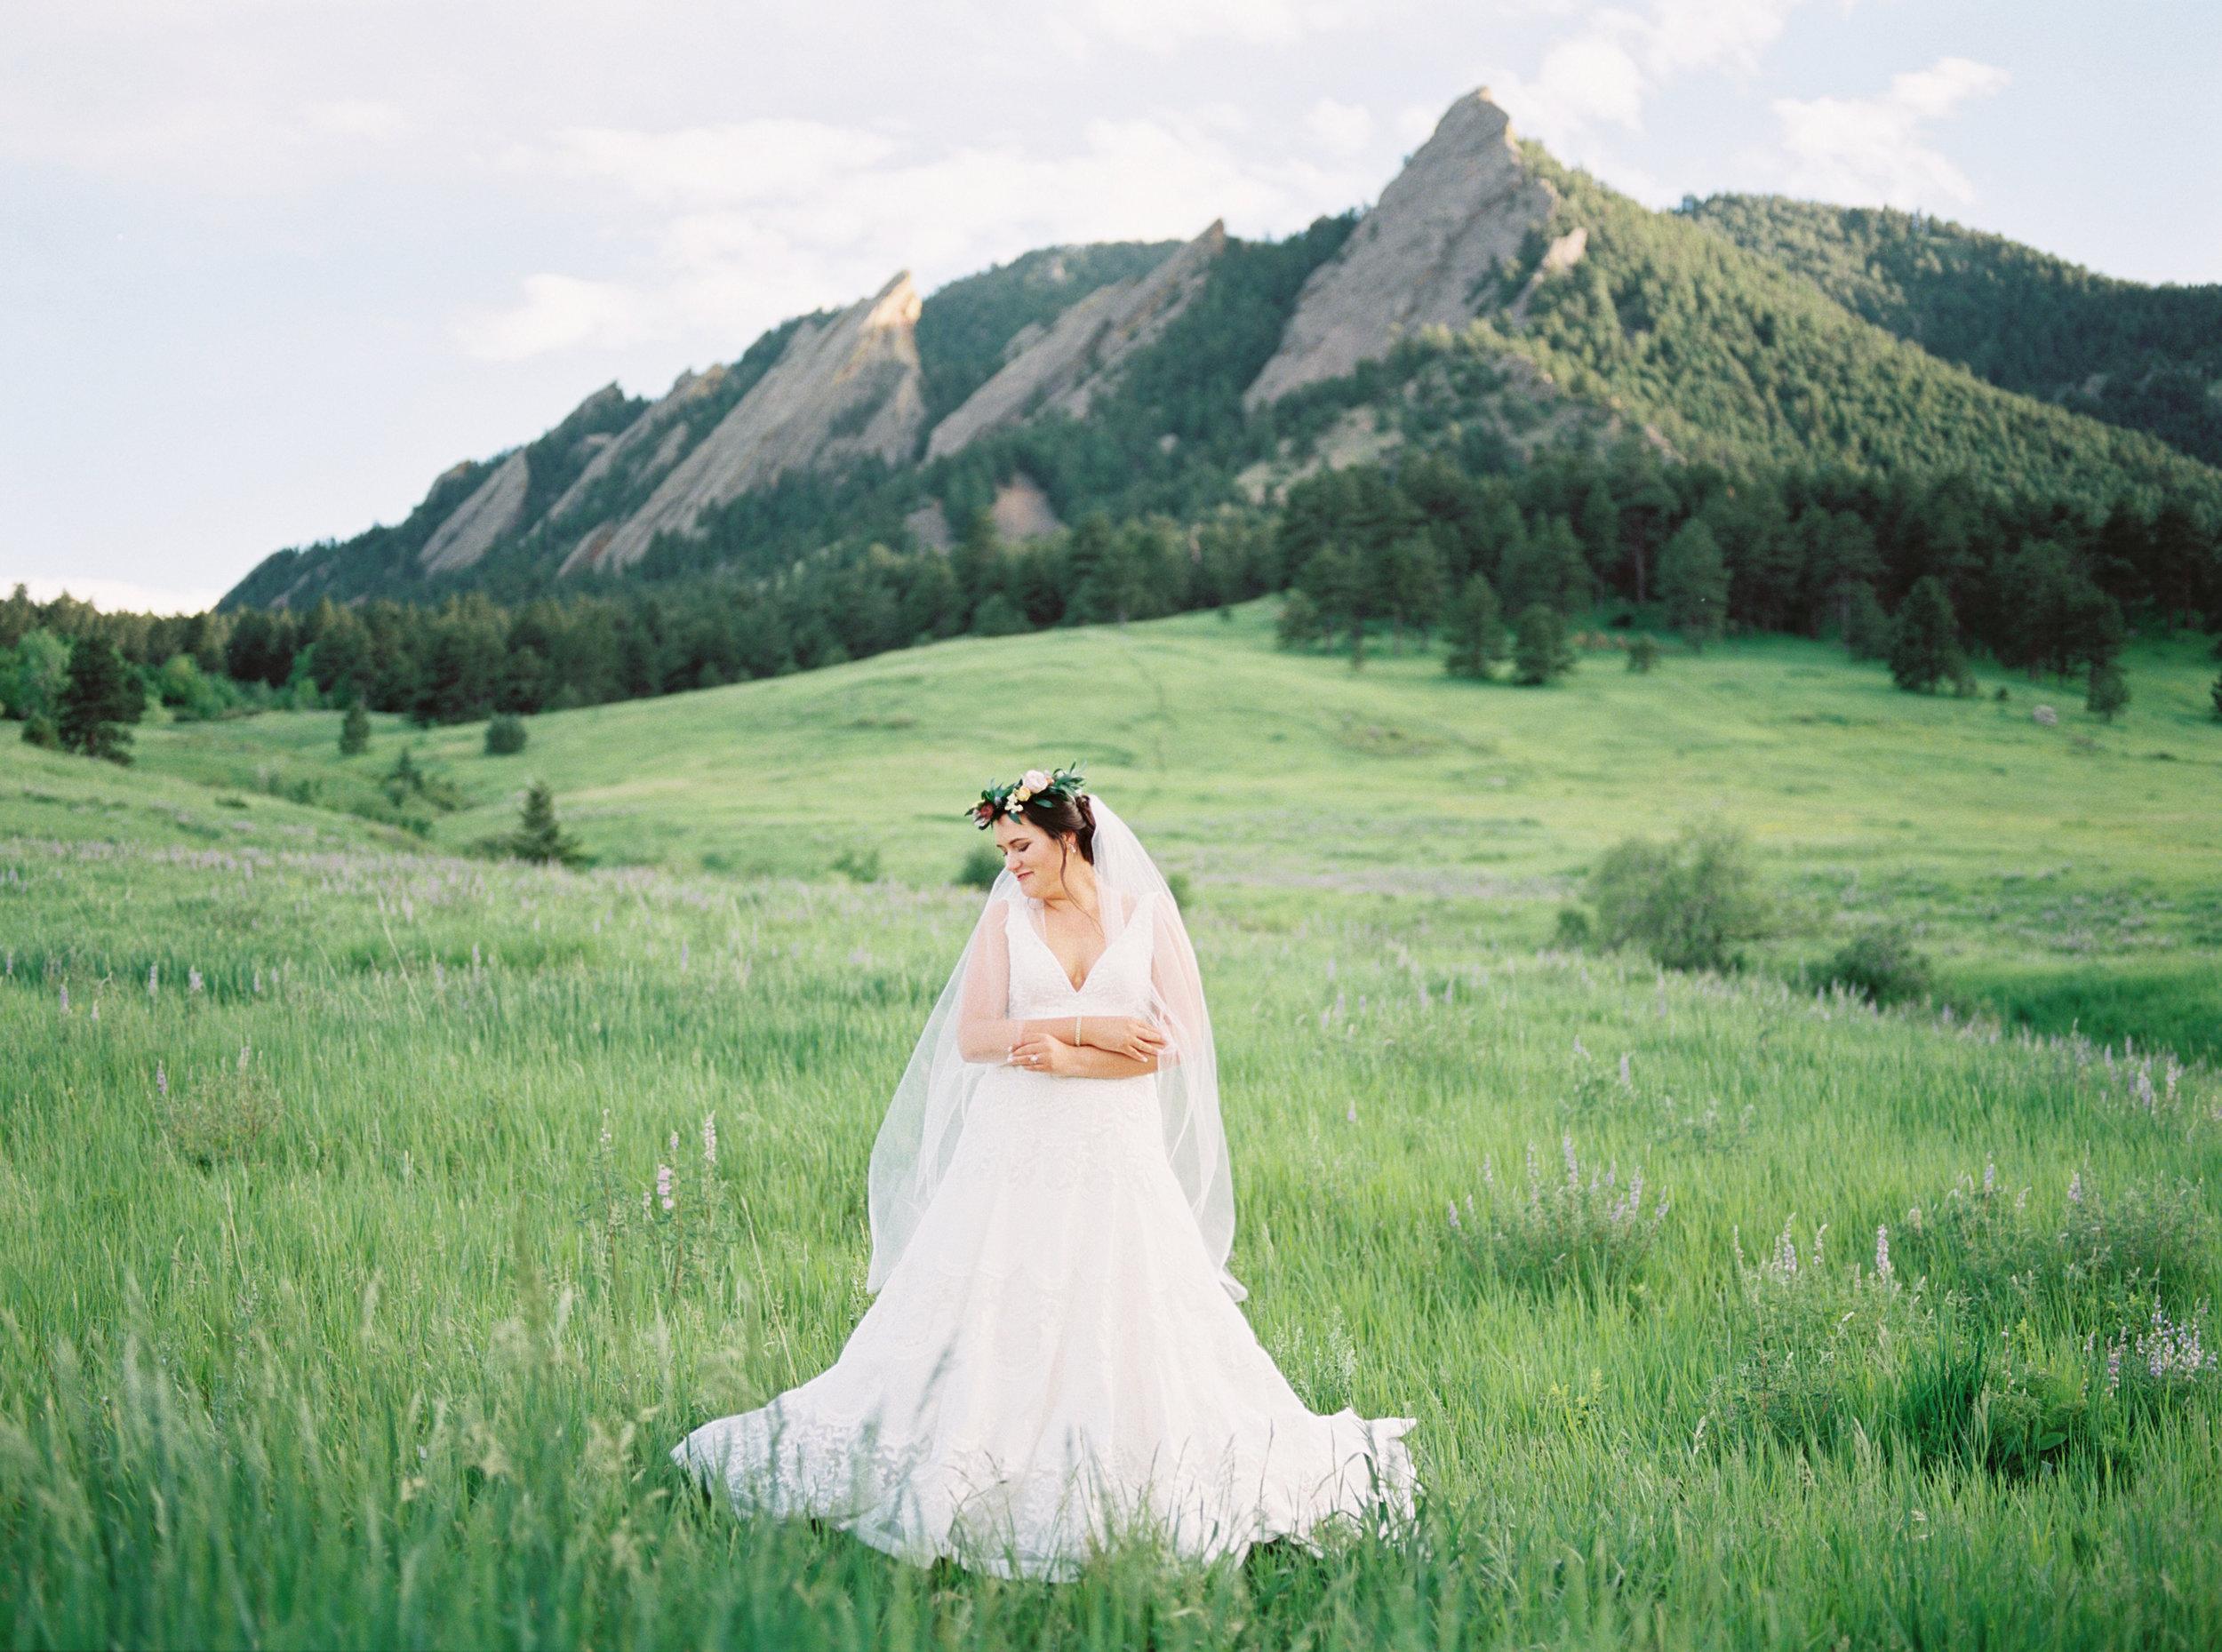 Traditional Bridal Portraits by Film Photographer Tara Bielecki in Boulder, Colorado